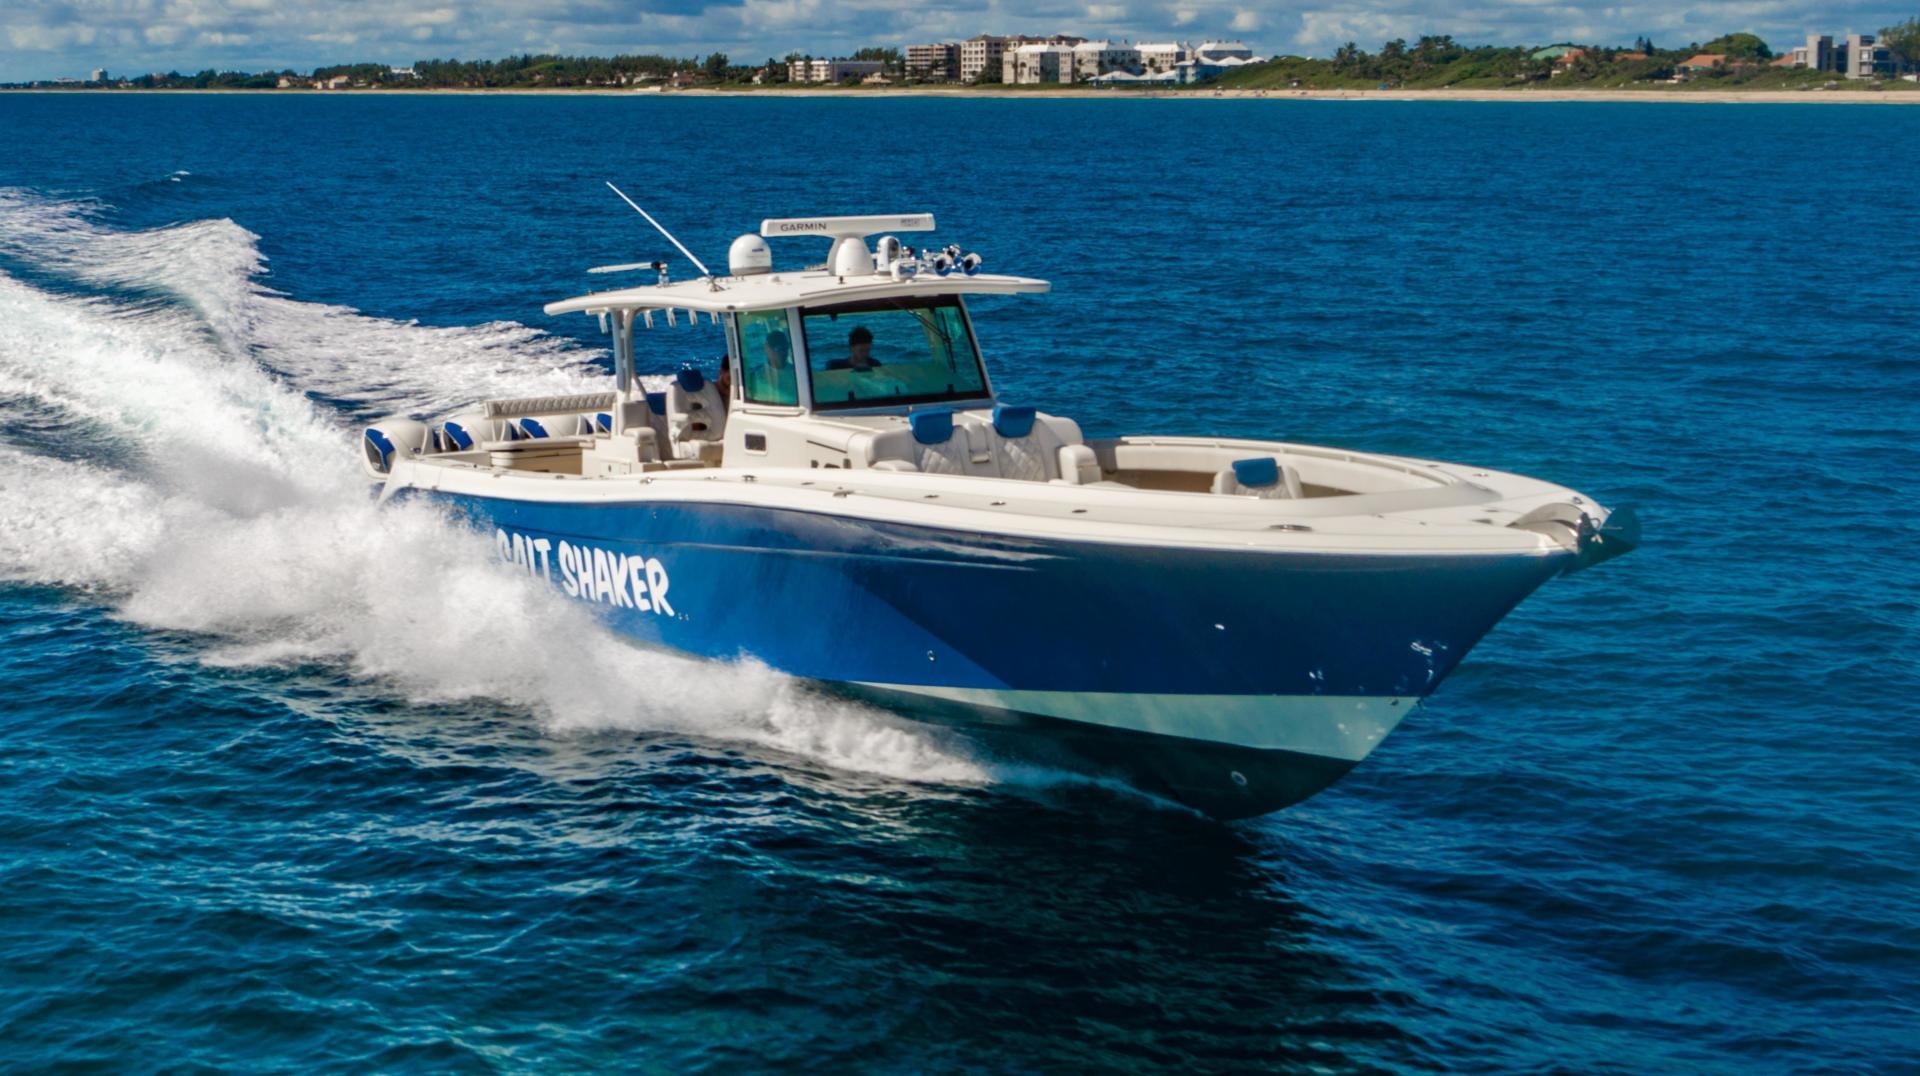 HCB-Suenos 2016-Salt Shaker Ft. Lauderdale-Florida-United States-1548633 | Thumbnail